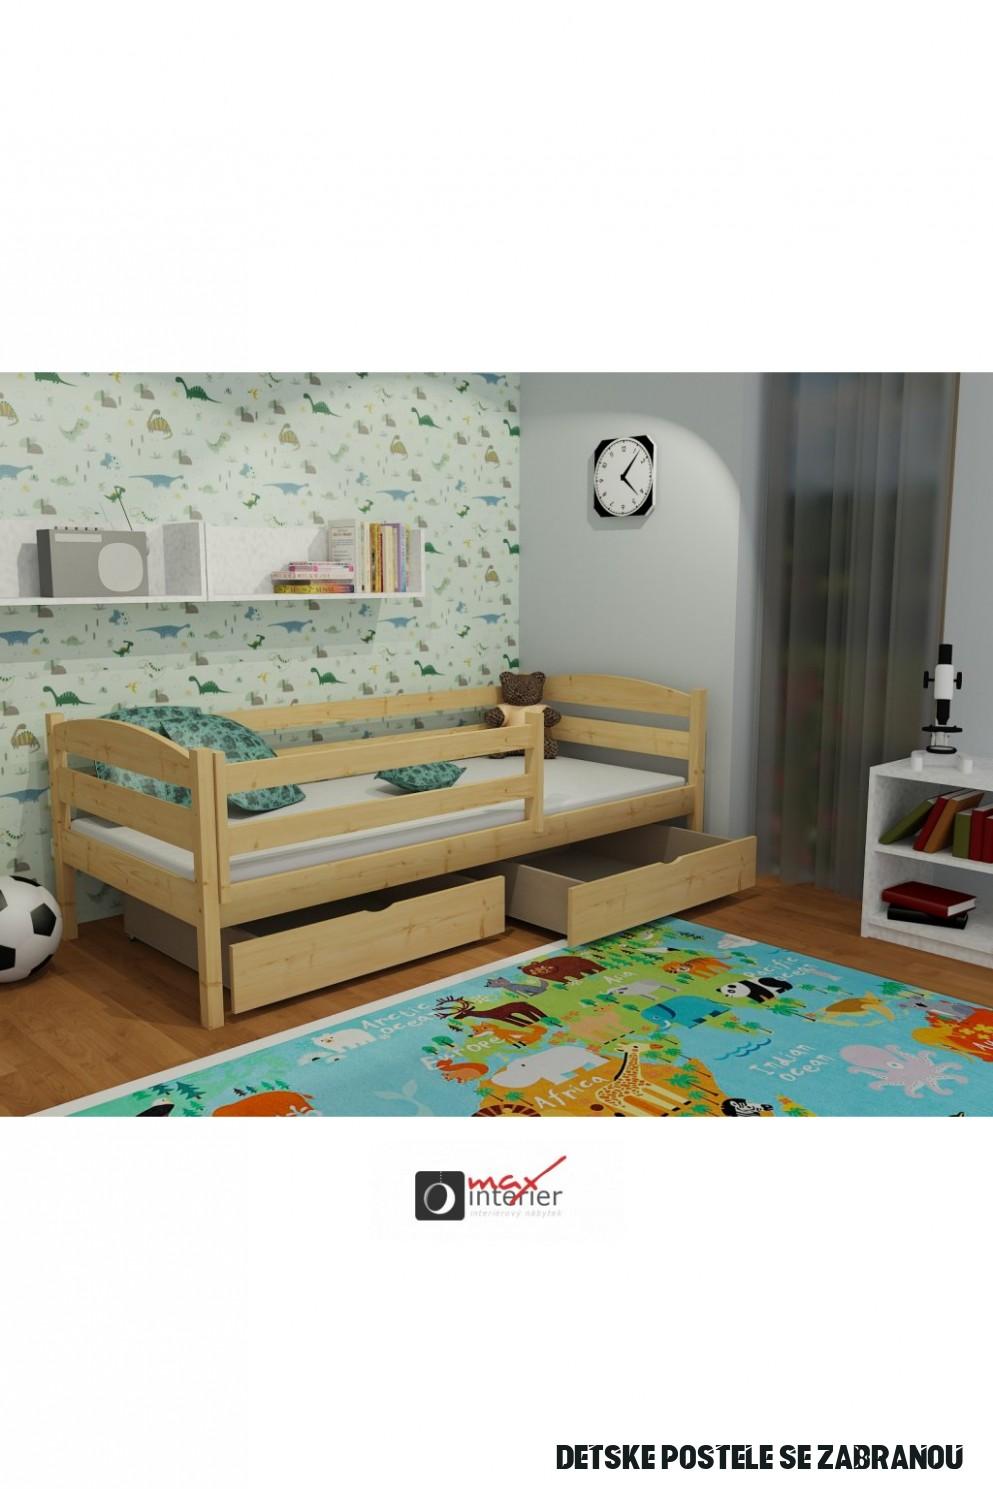 Dětská postel se zábranou ŽOFKA PINE vč. roštu